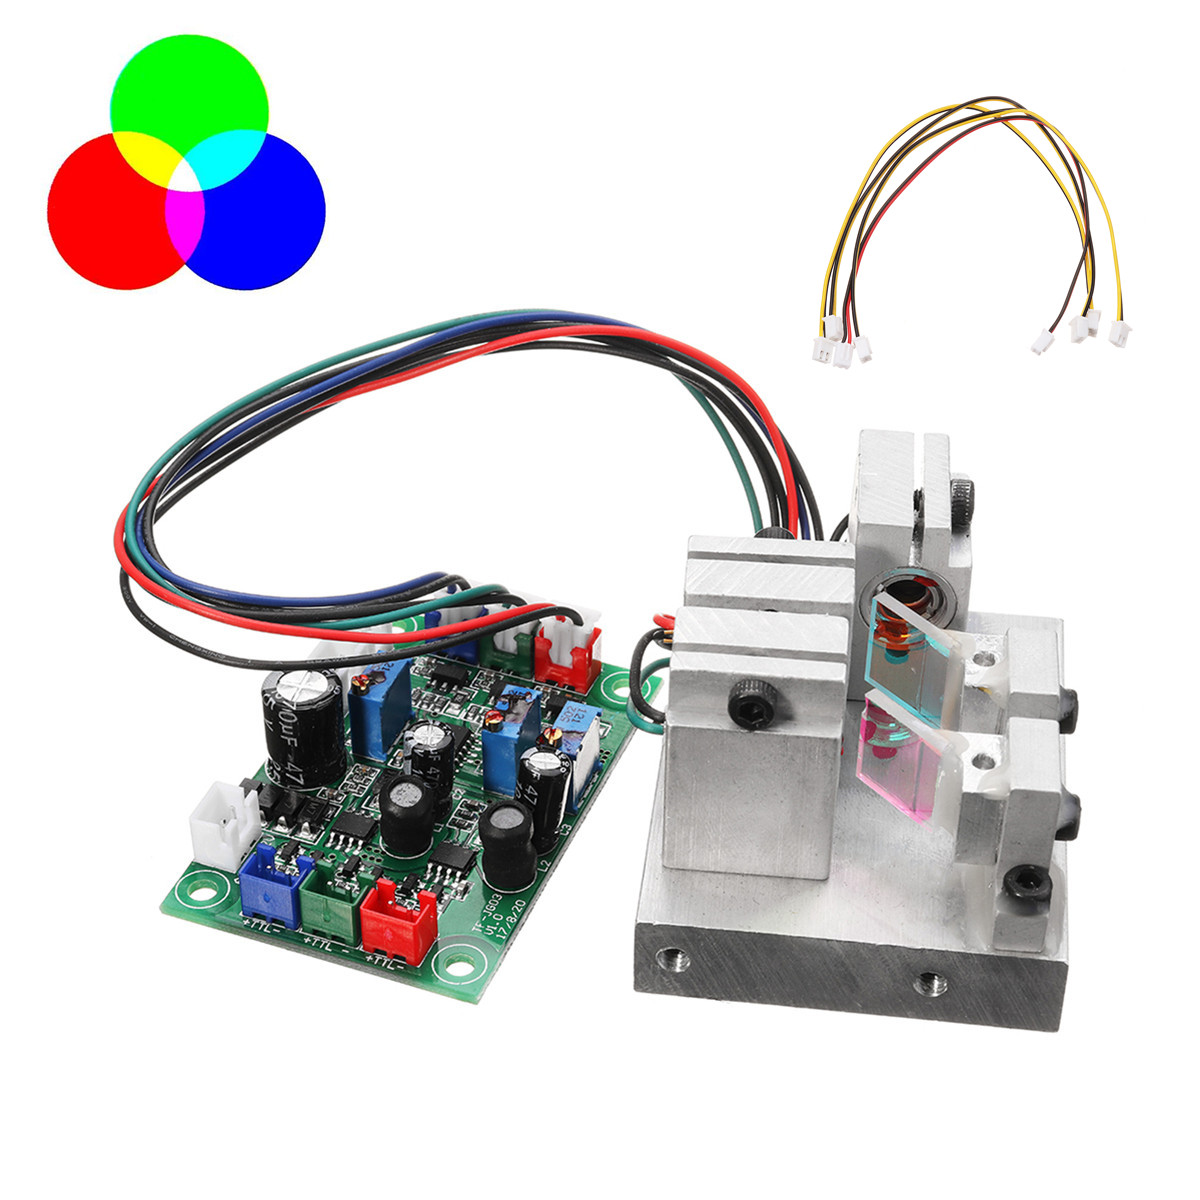 White Laser Module RGB 300mW 638nm+520nm+450nm With TTL Driver Board Modulation Temperature Protection Precision Science